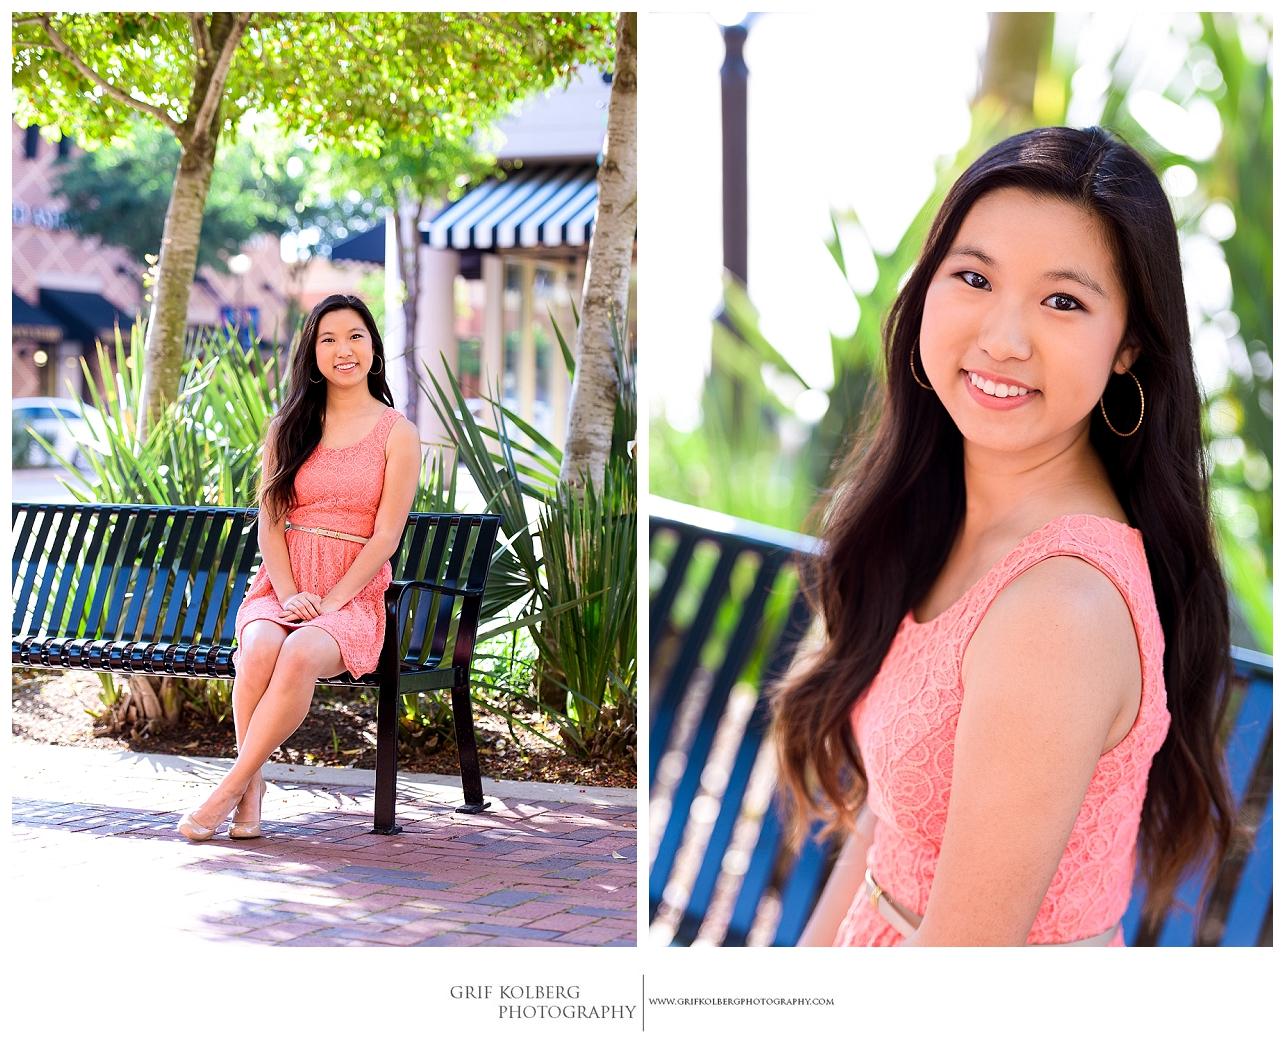 Senior Portrait Photographer, Clements High School Senior Photo, Sugar Land, TX